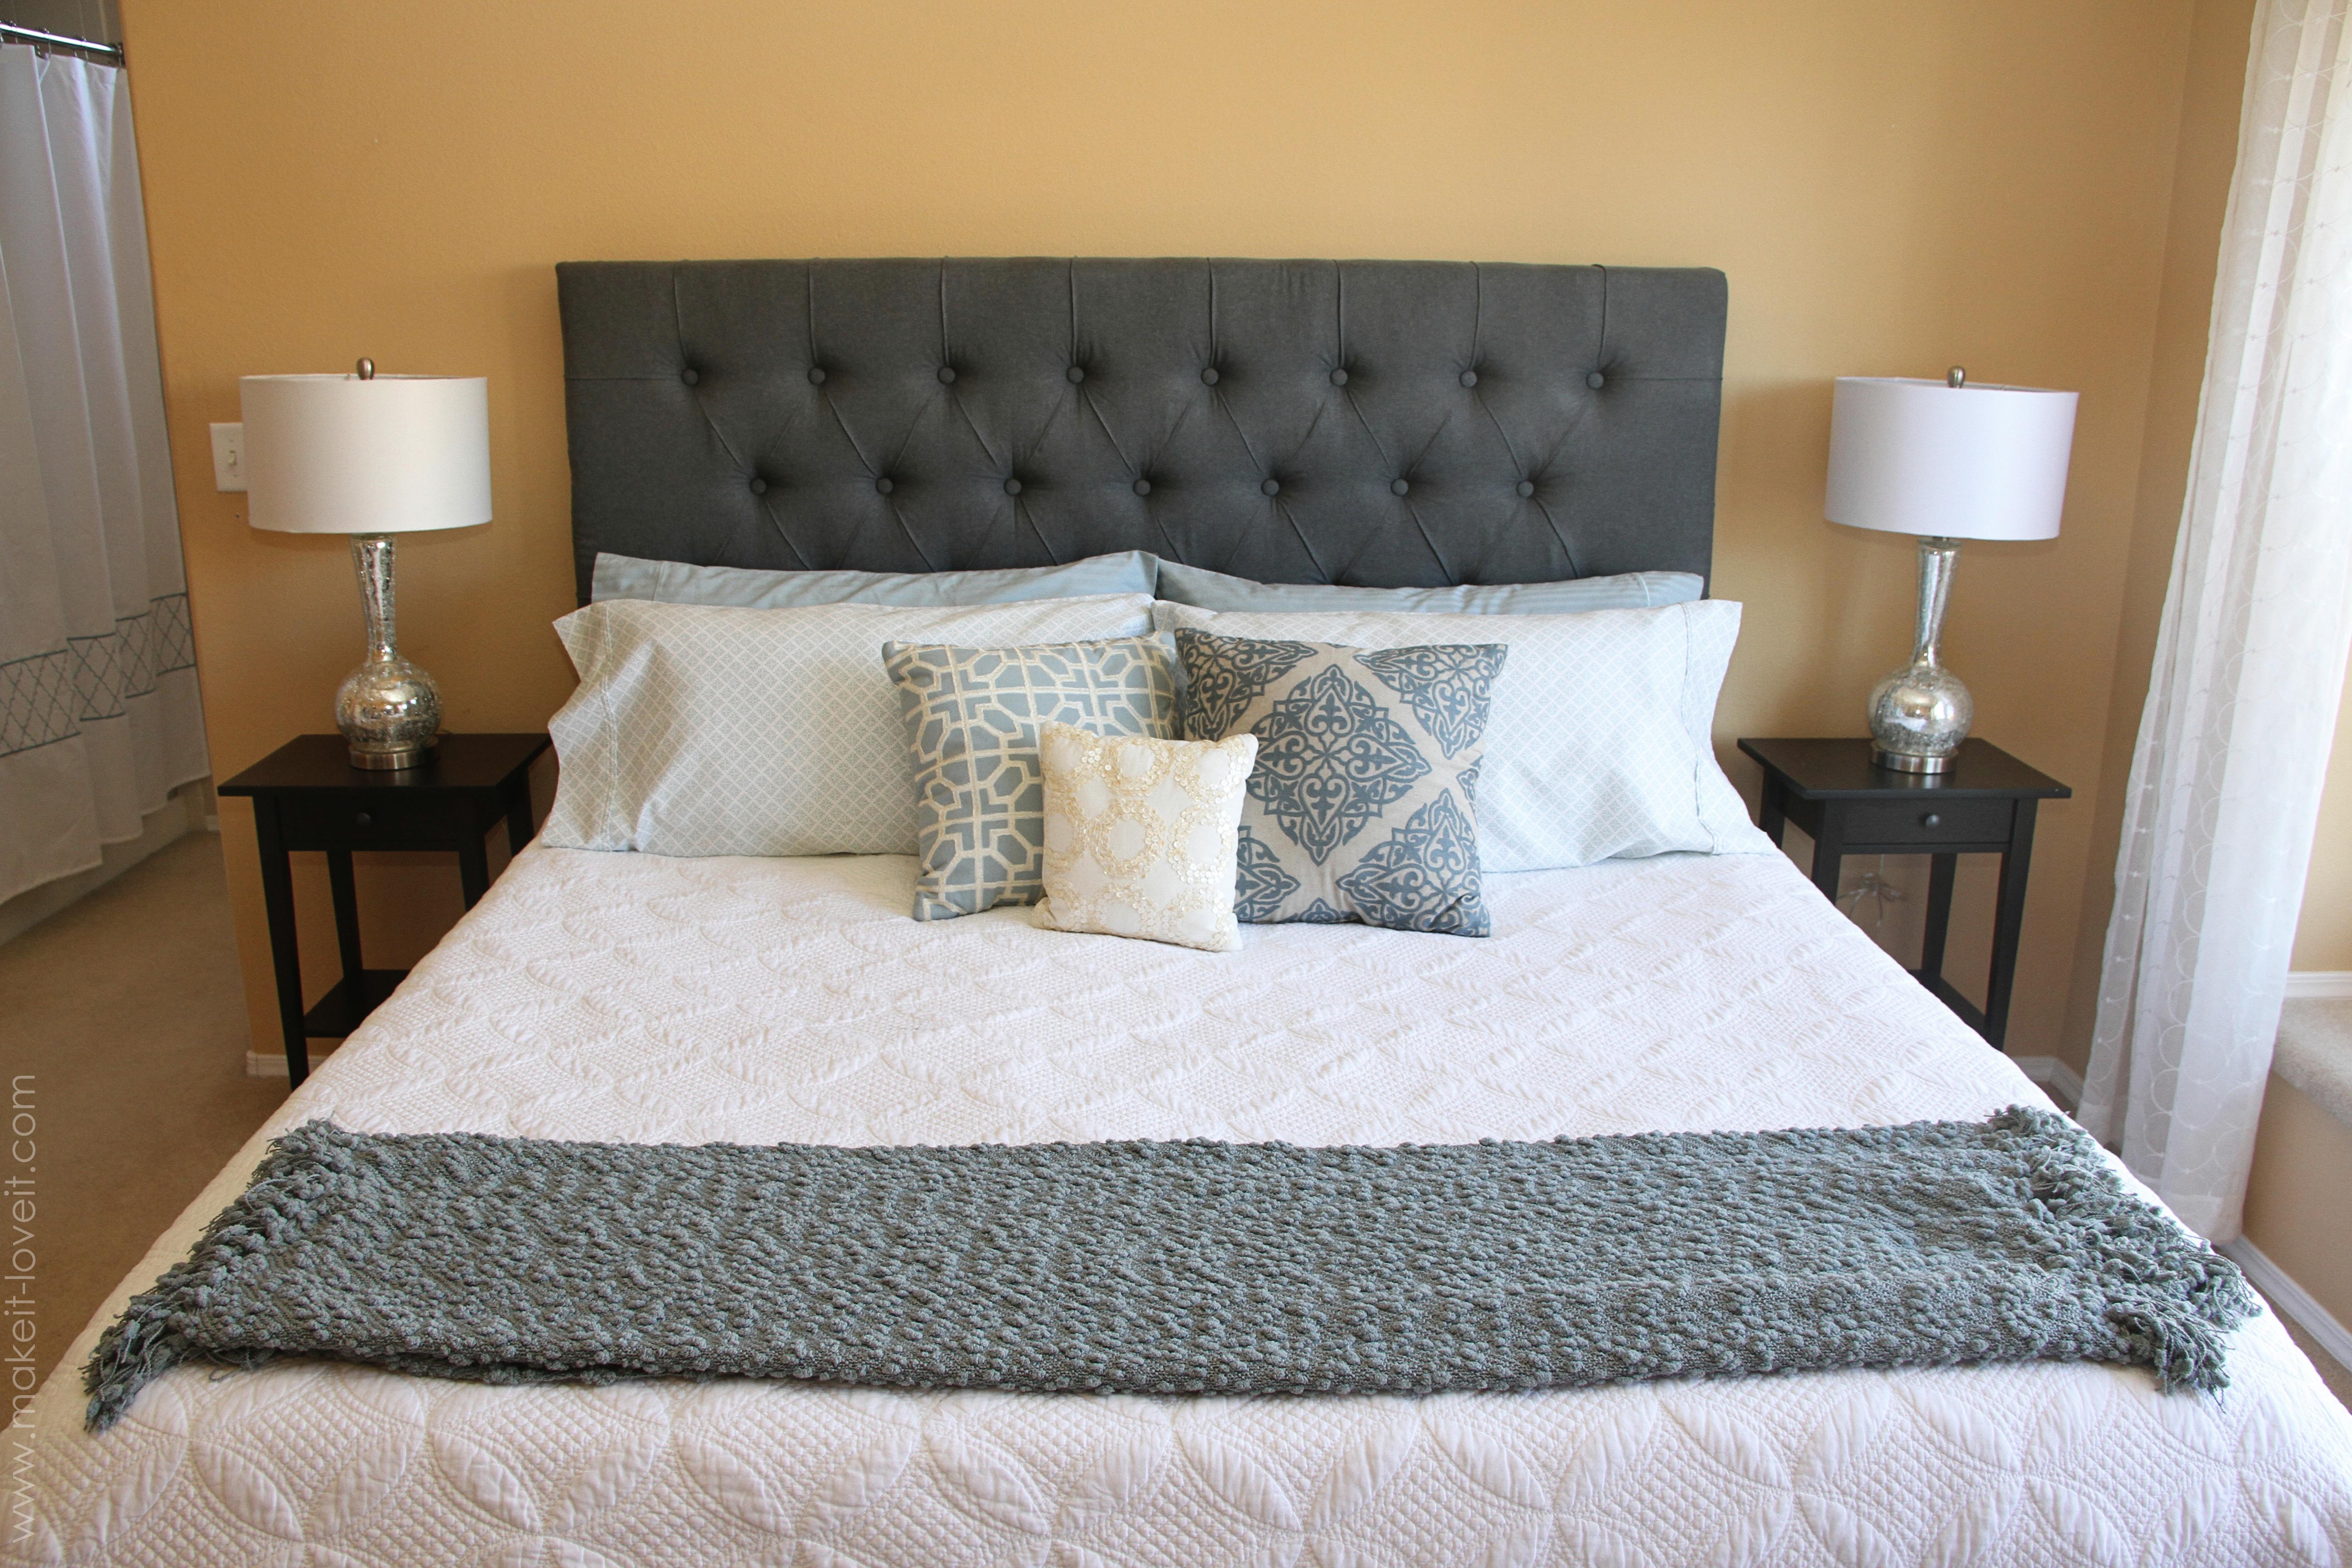 neat bed textile free images cover pillows material furniture floor photo en public flooring sheet domain bedroom duvet